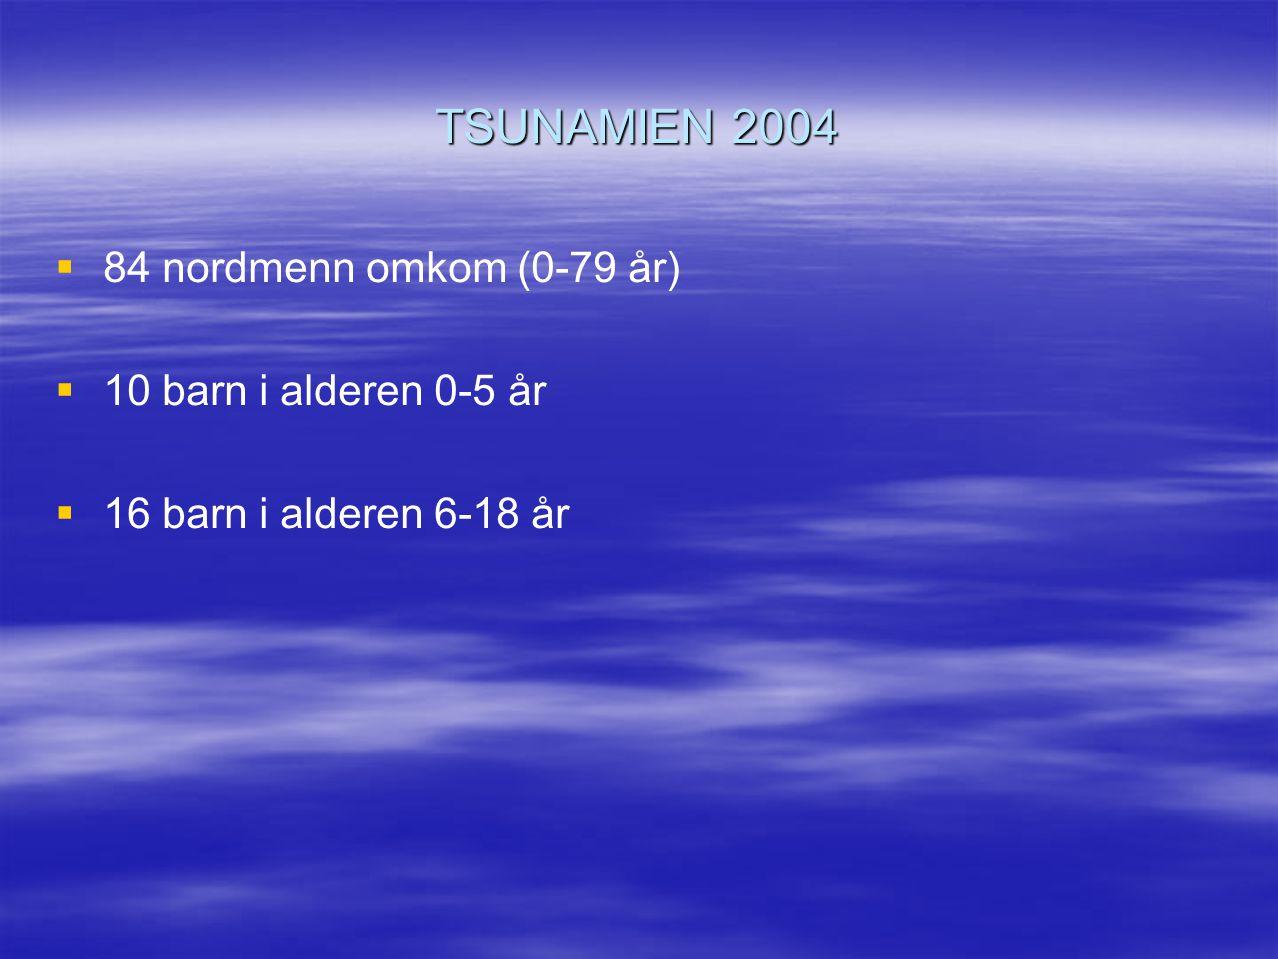 TSUNAMIEN 2004   84 nordmenn omkom (0-79 år)   10 barn i alderen 0-5 år   16 barn i alderen 6-18 år